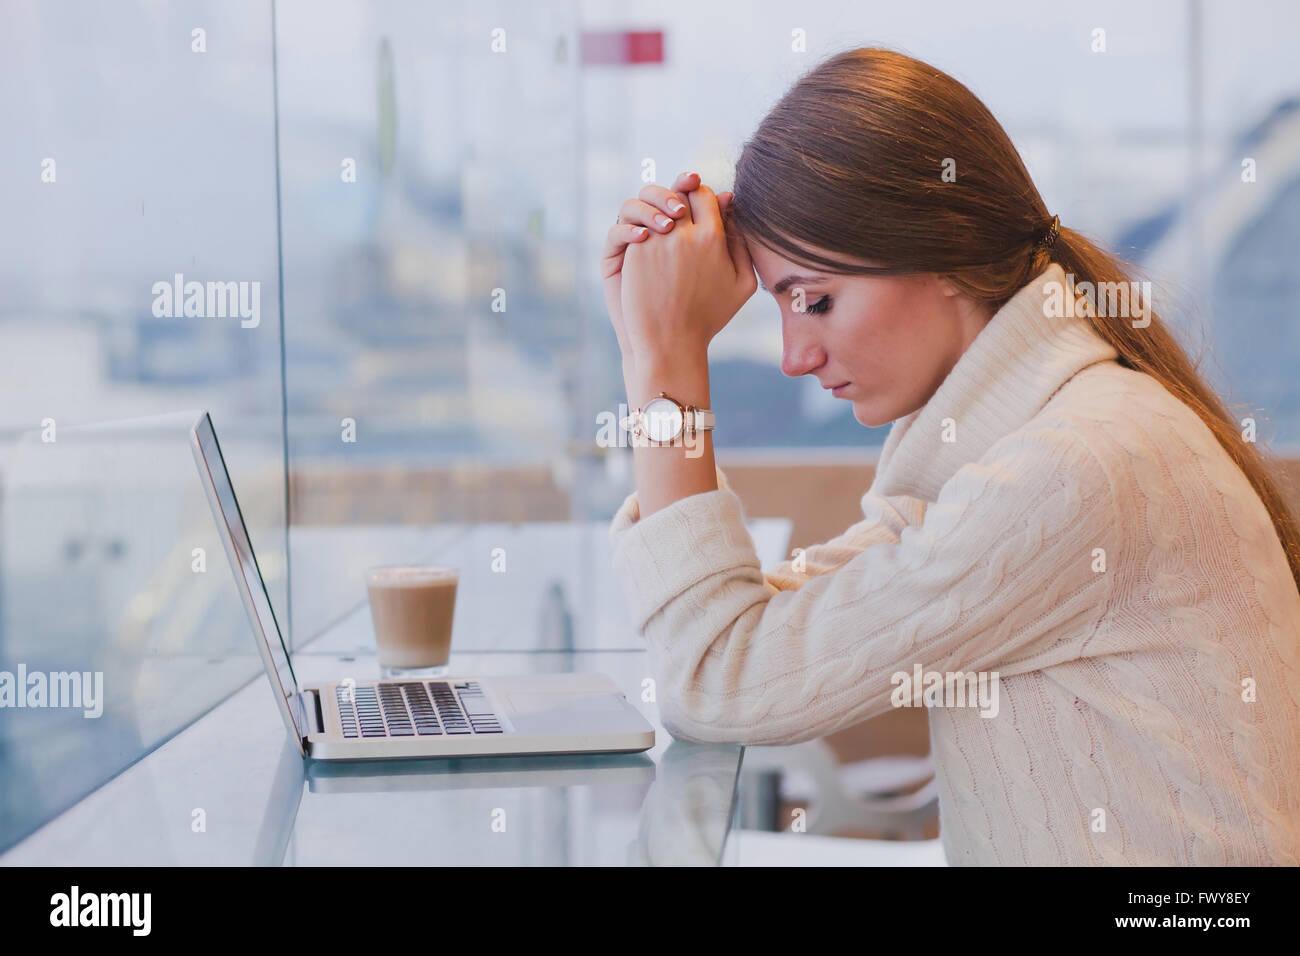 Arbeitslosigkeit-Konzept, Problem, traurig müde Frau vor Laptop innen moderne helle café Stockbild